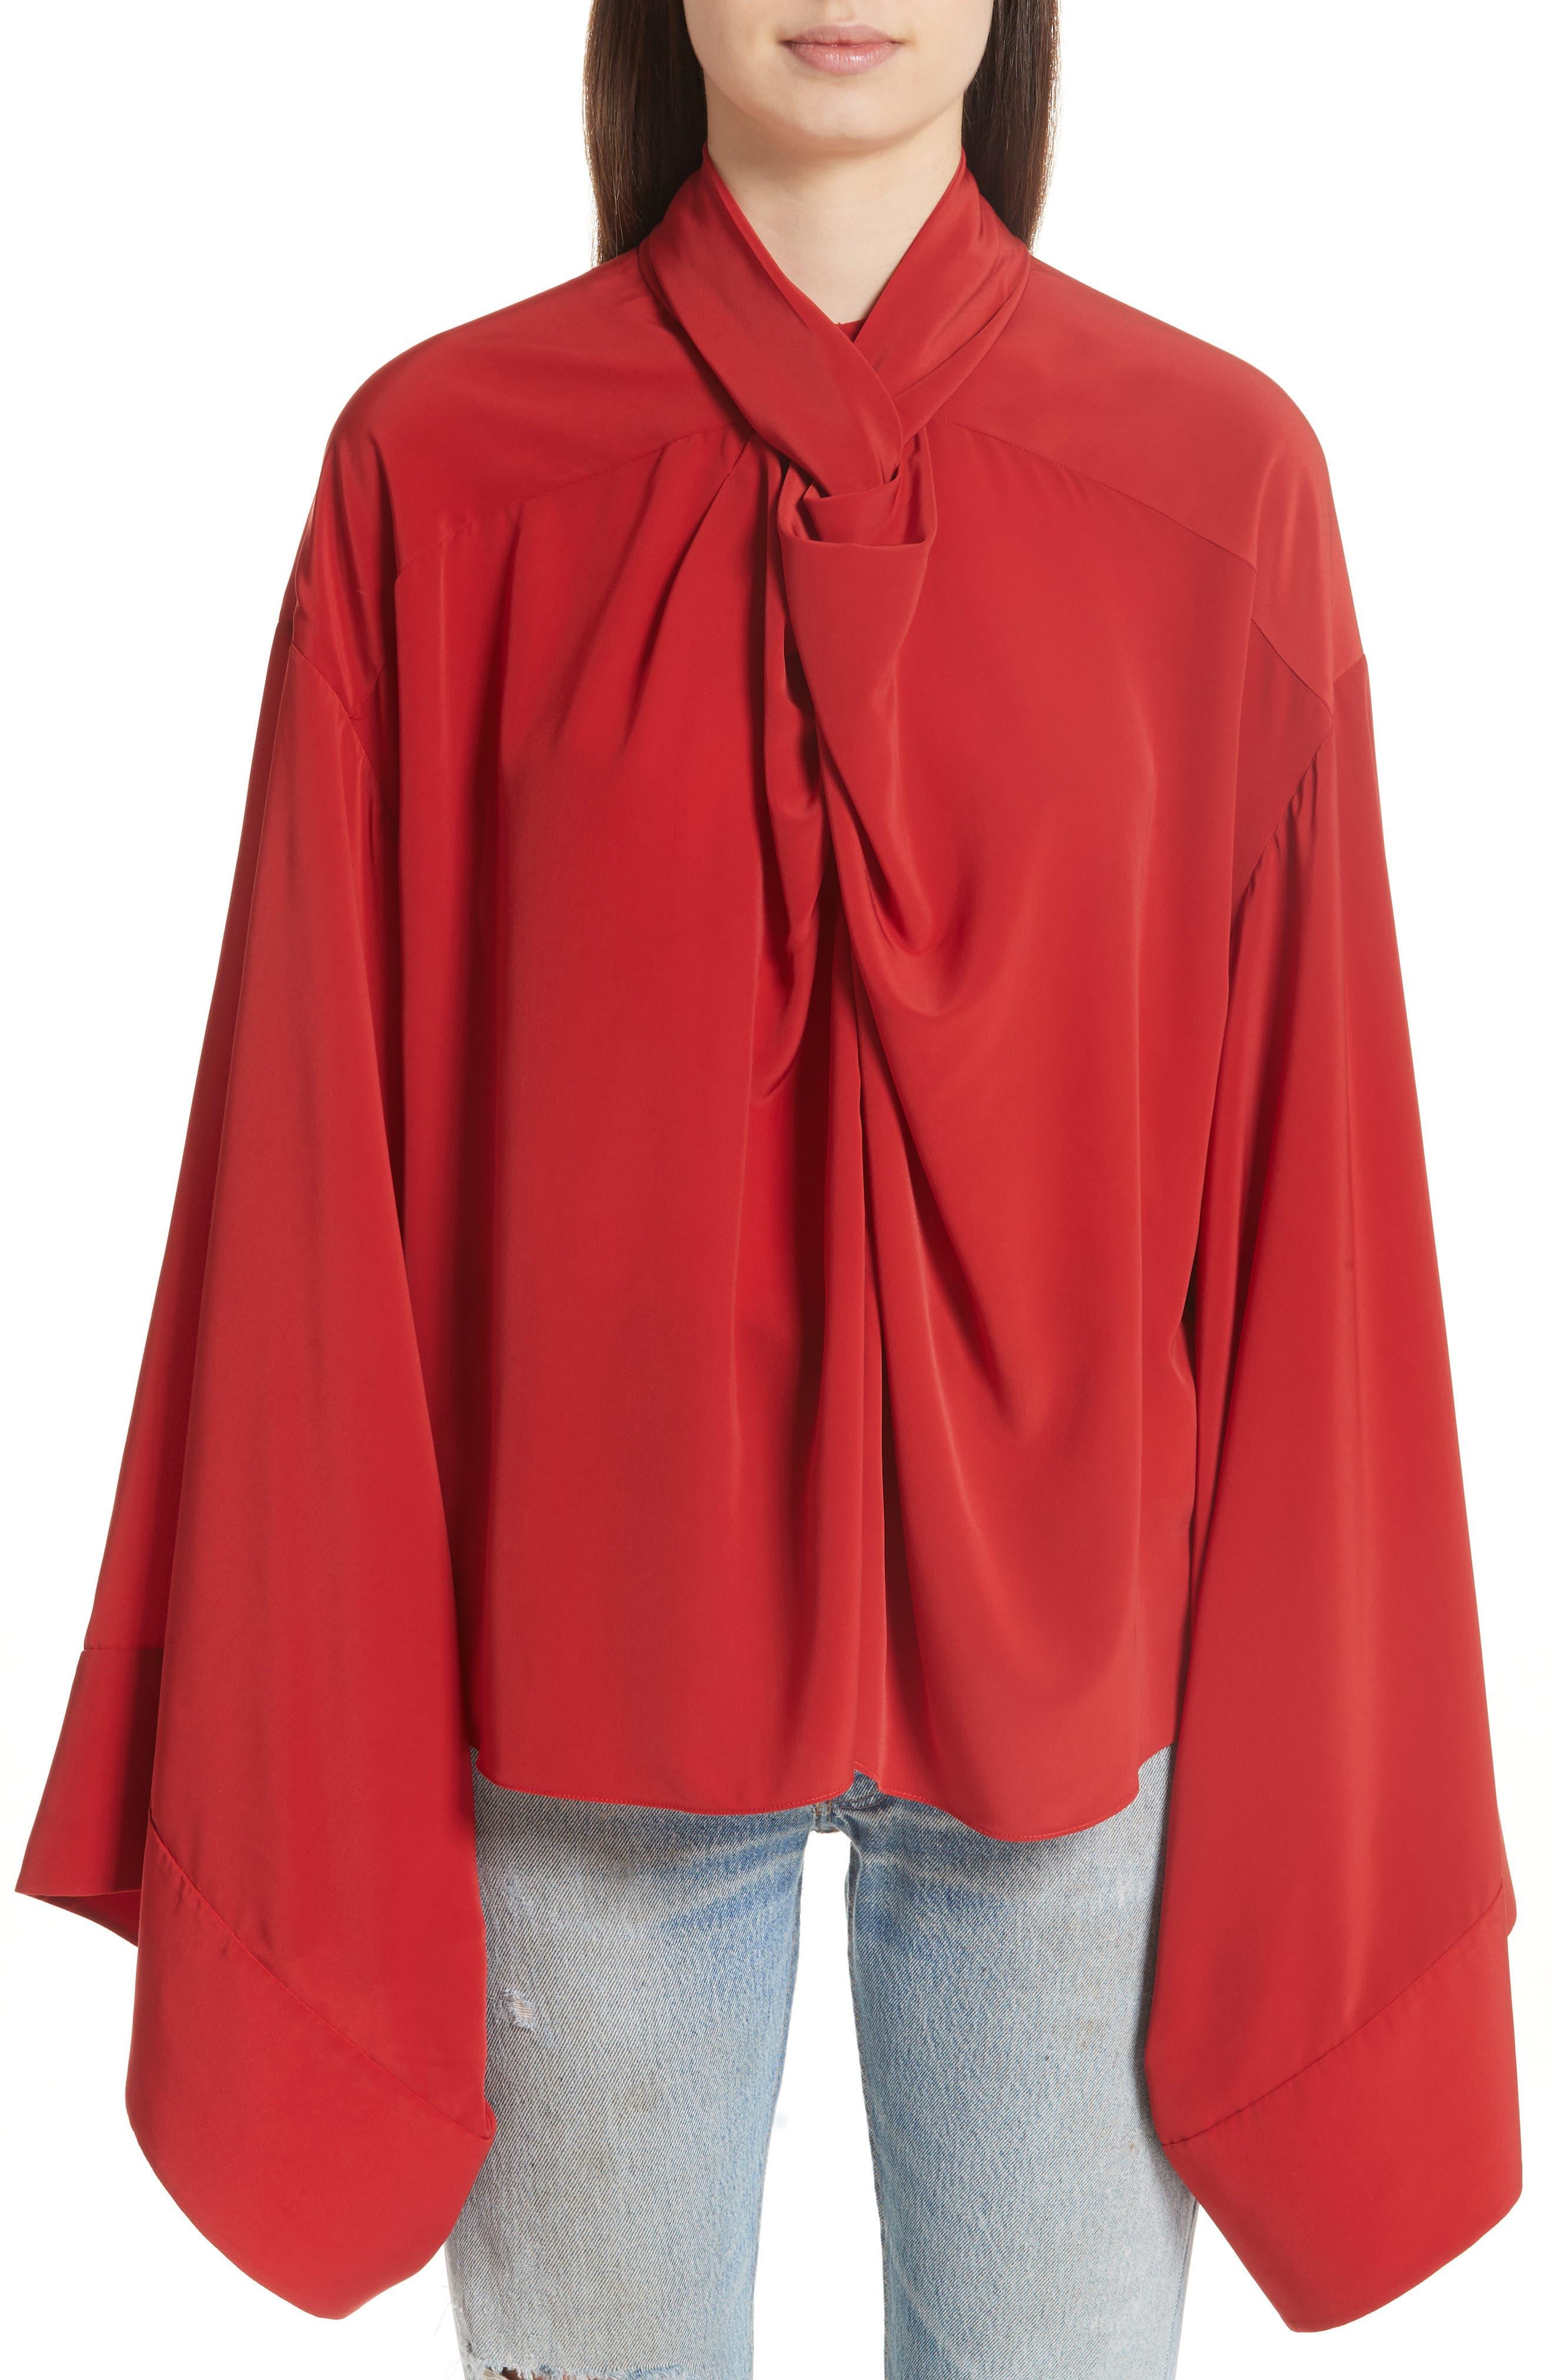 A.W.A.K.E. Kimono Sleeve Blouse (Nordstrom Exclusive)